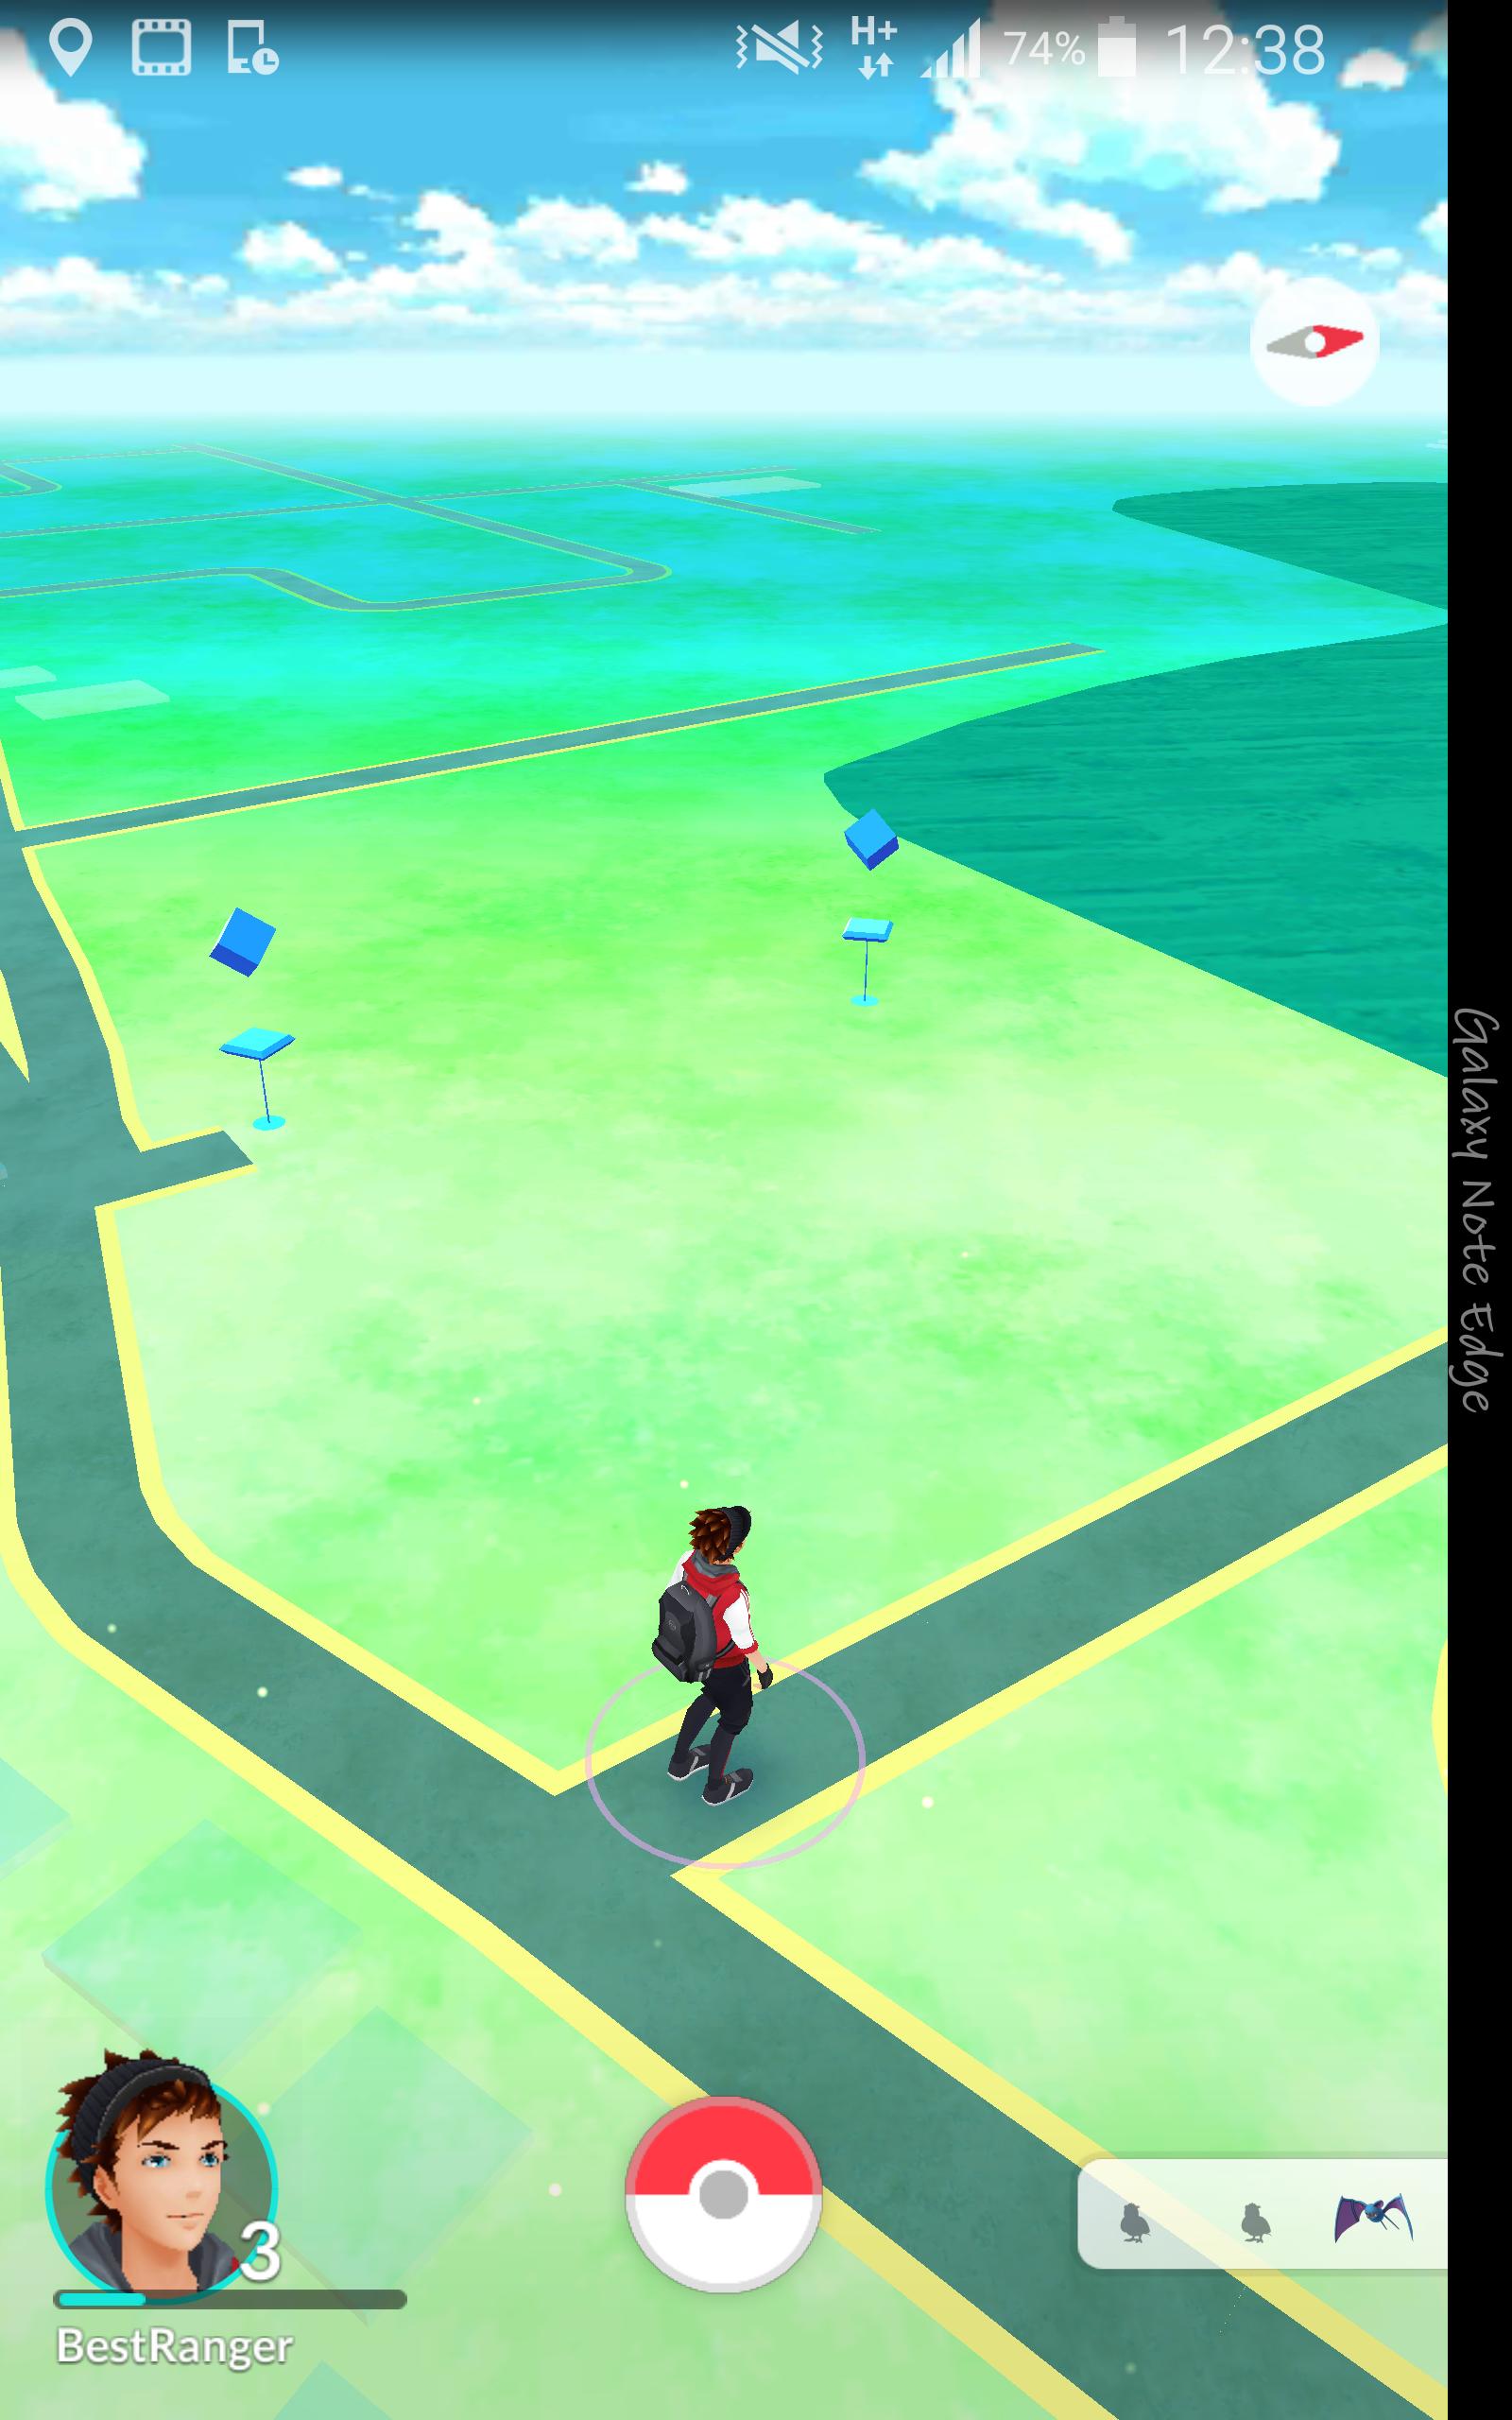 Svet-PokemonGO